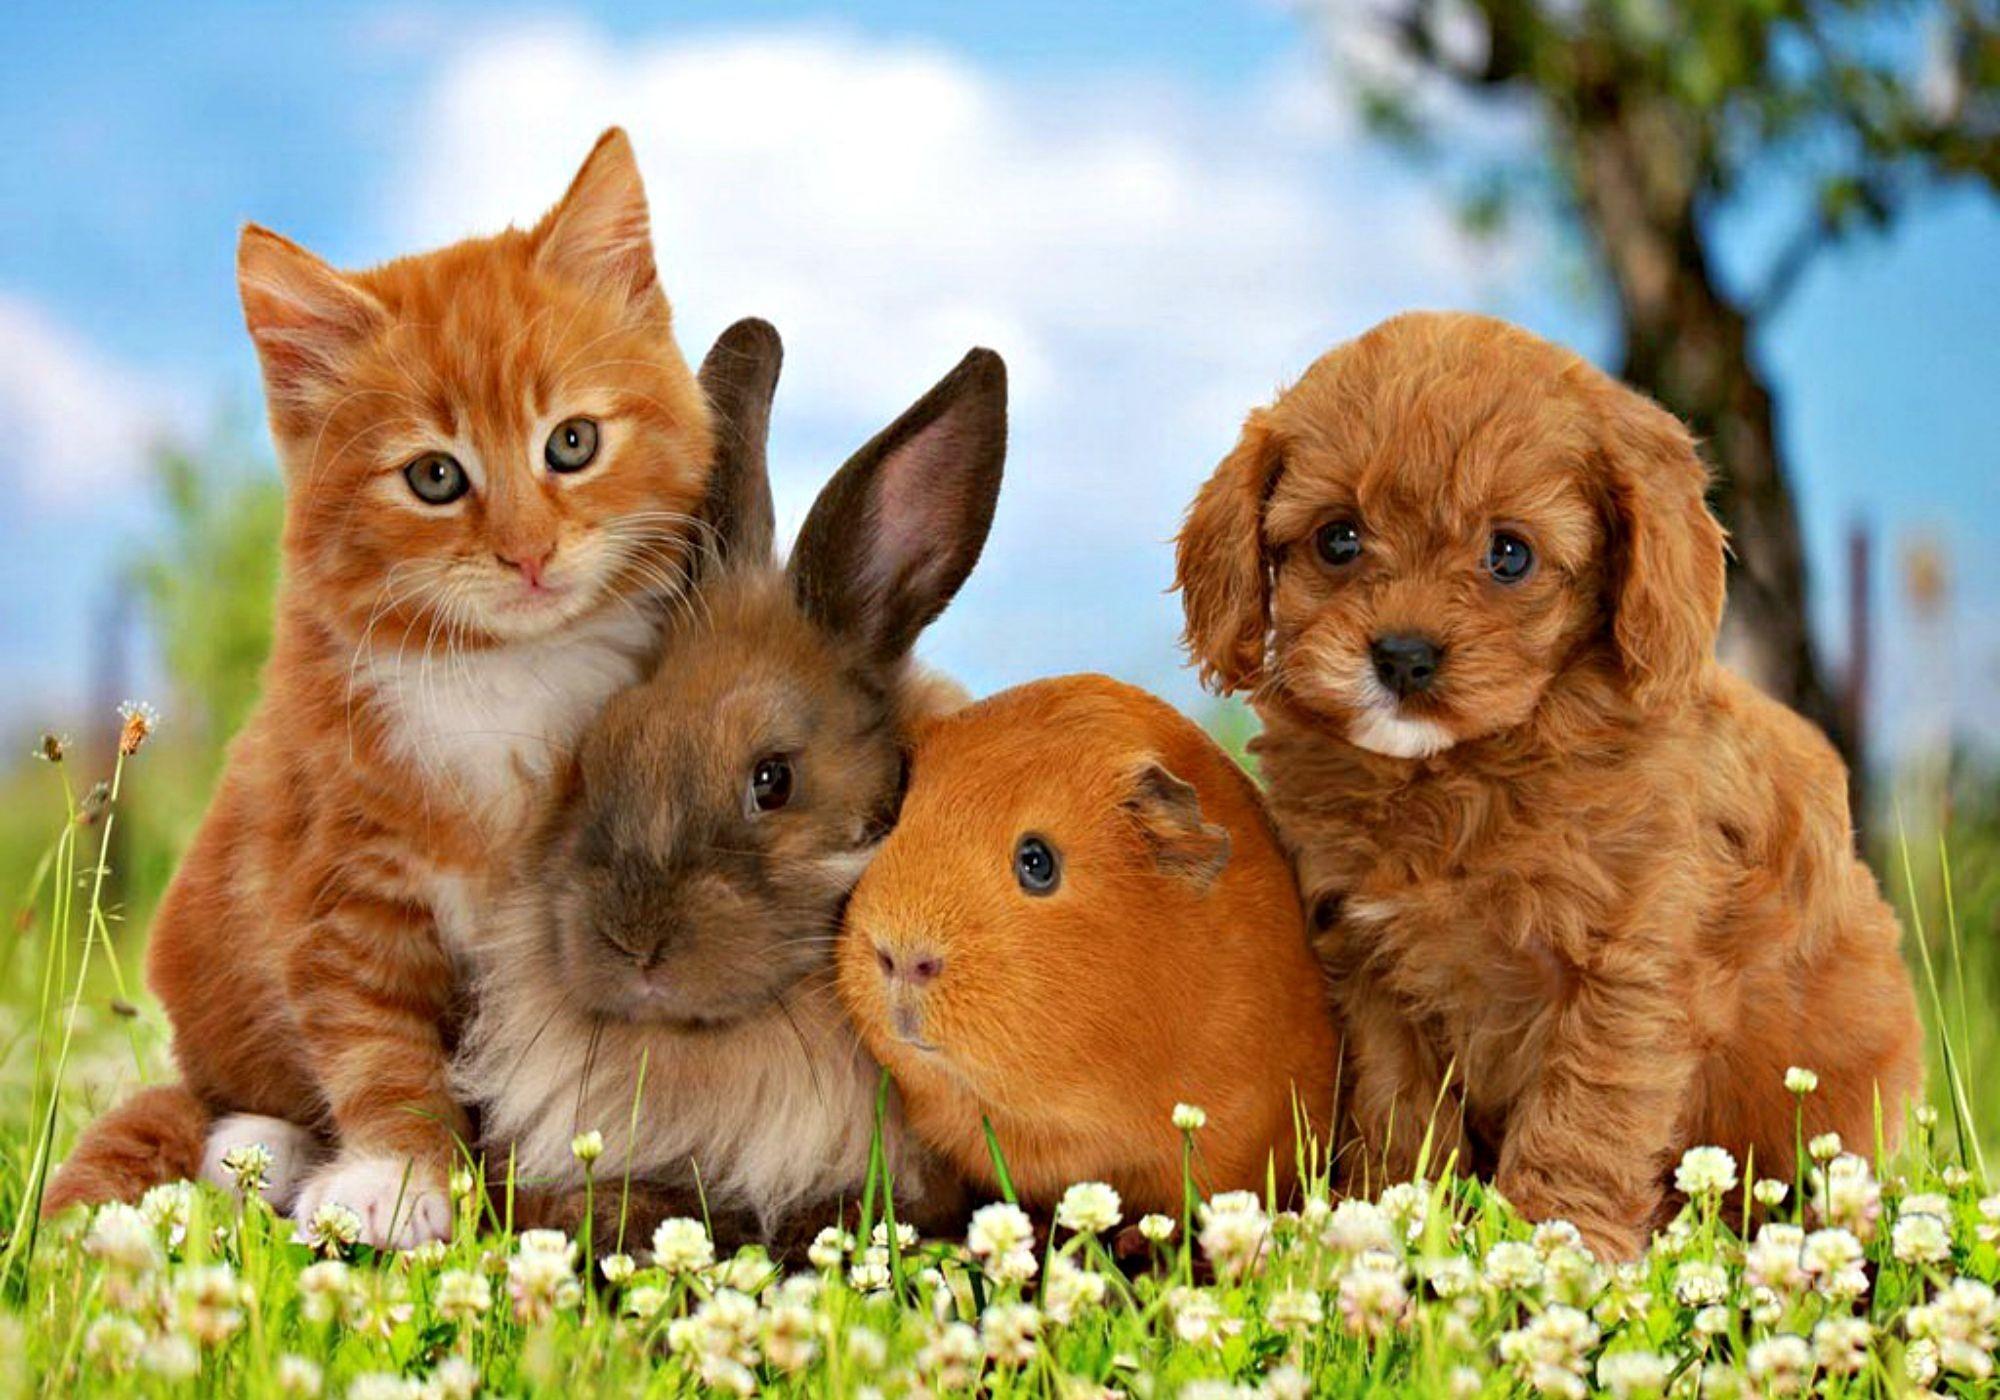 cats dogs wallpaper desktop (51+ images)